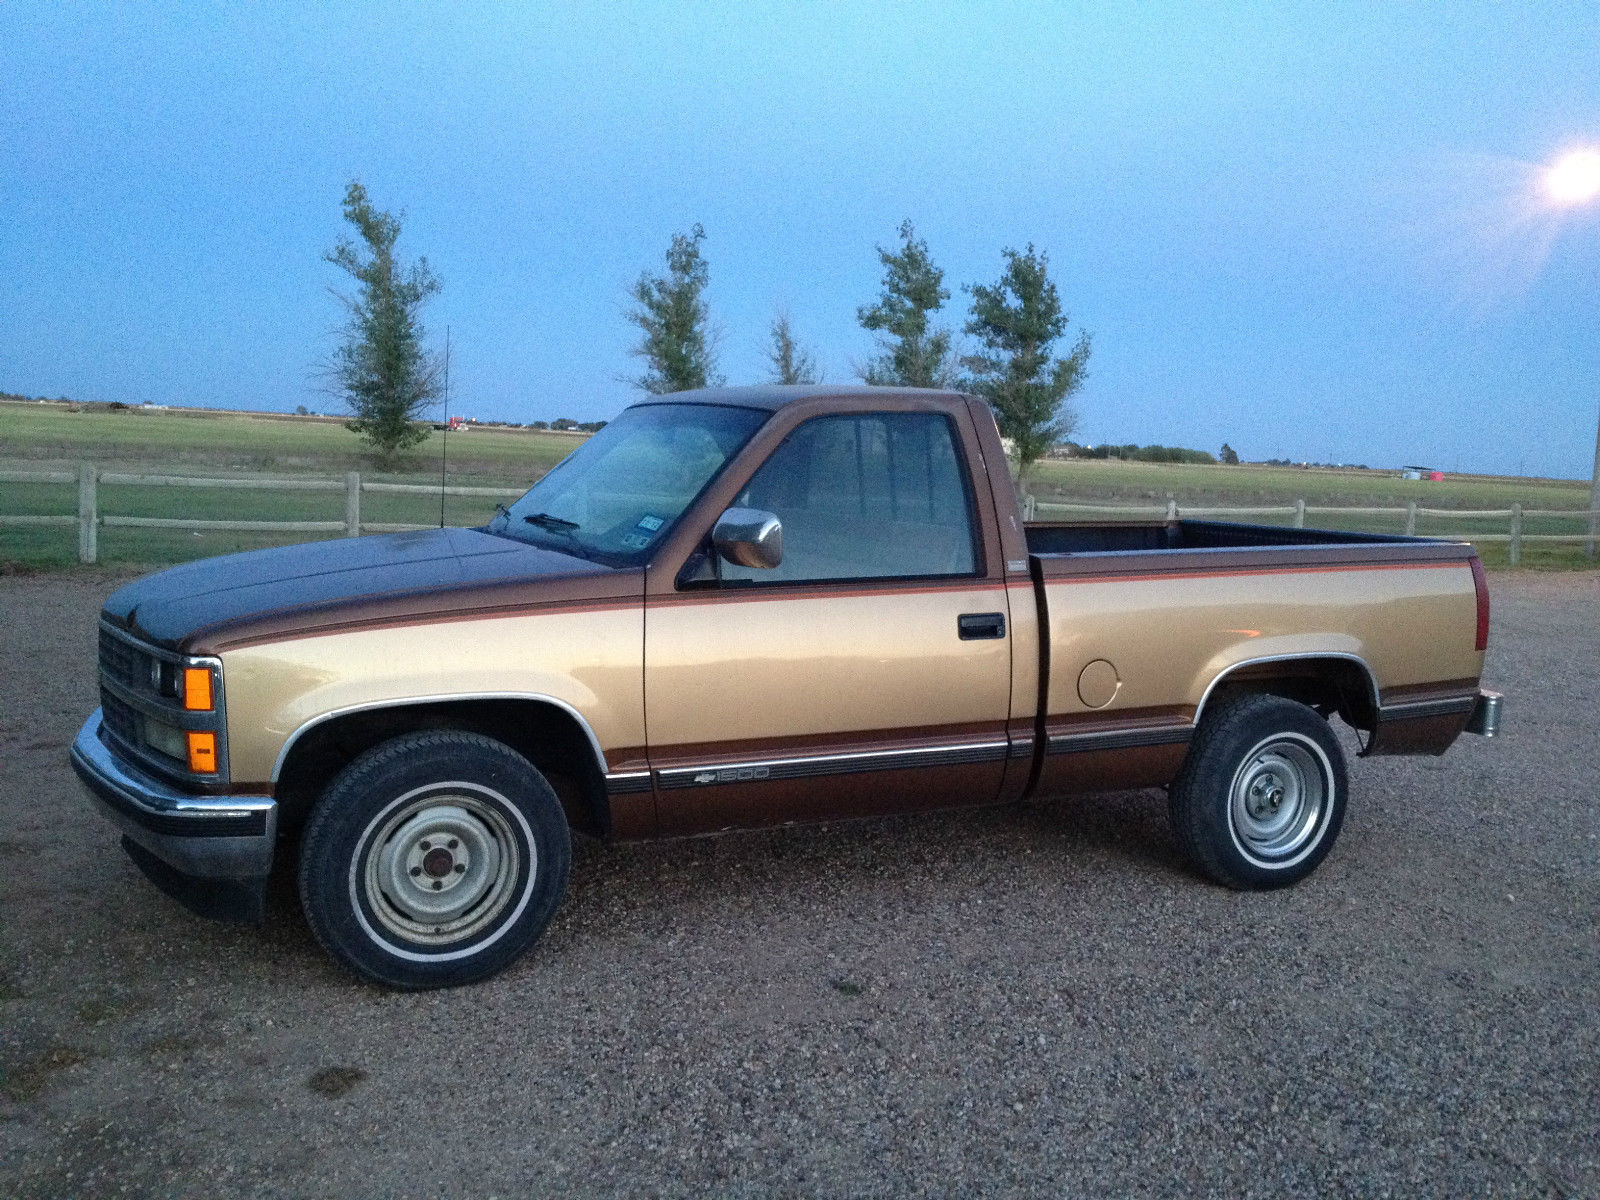 hight resolution of 1989 chevy silverado 1500 c k1500 pickup truck chevrolet 5 0 l fleetside swb